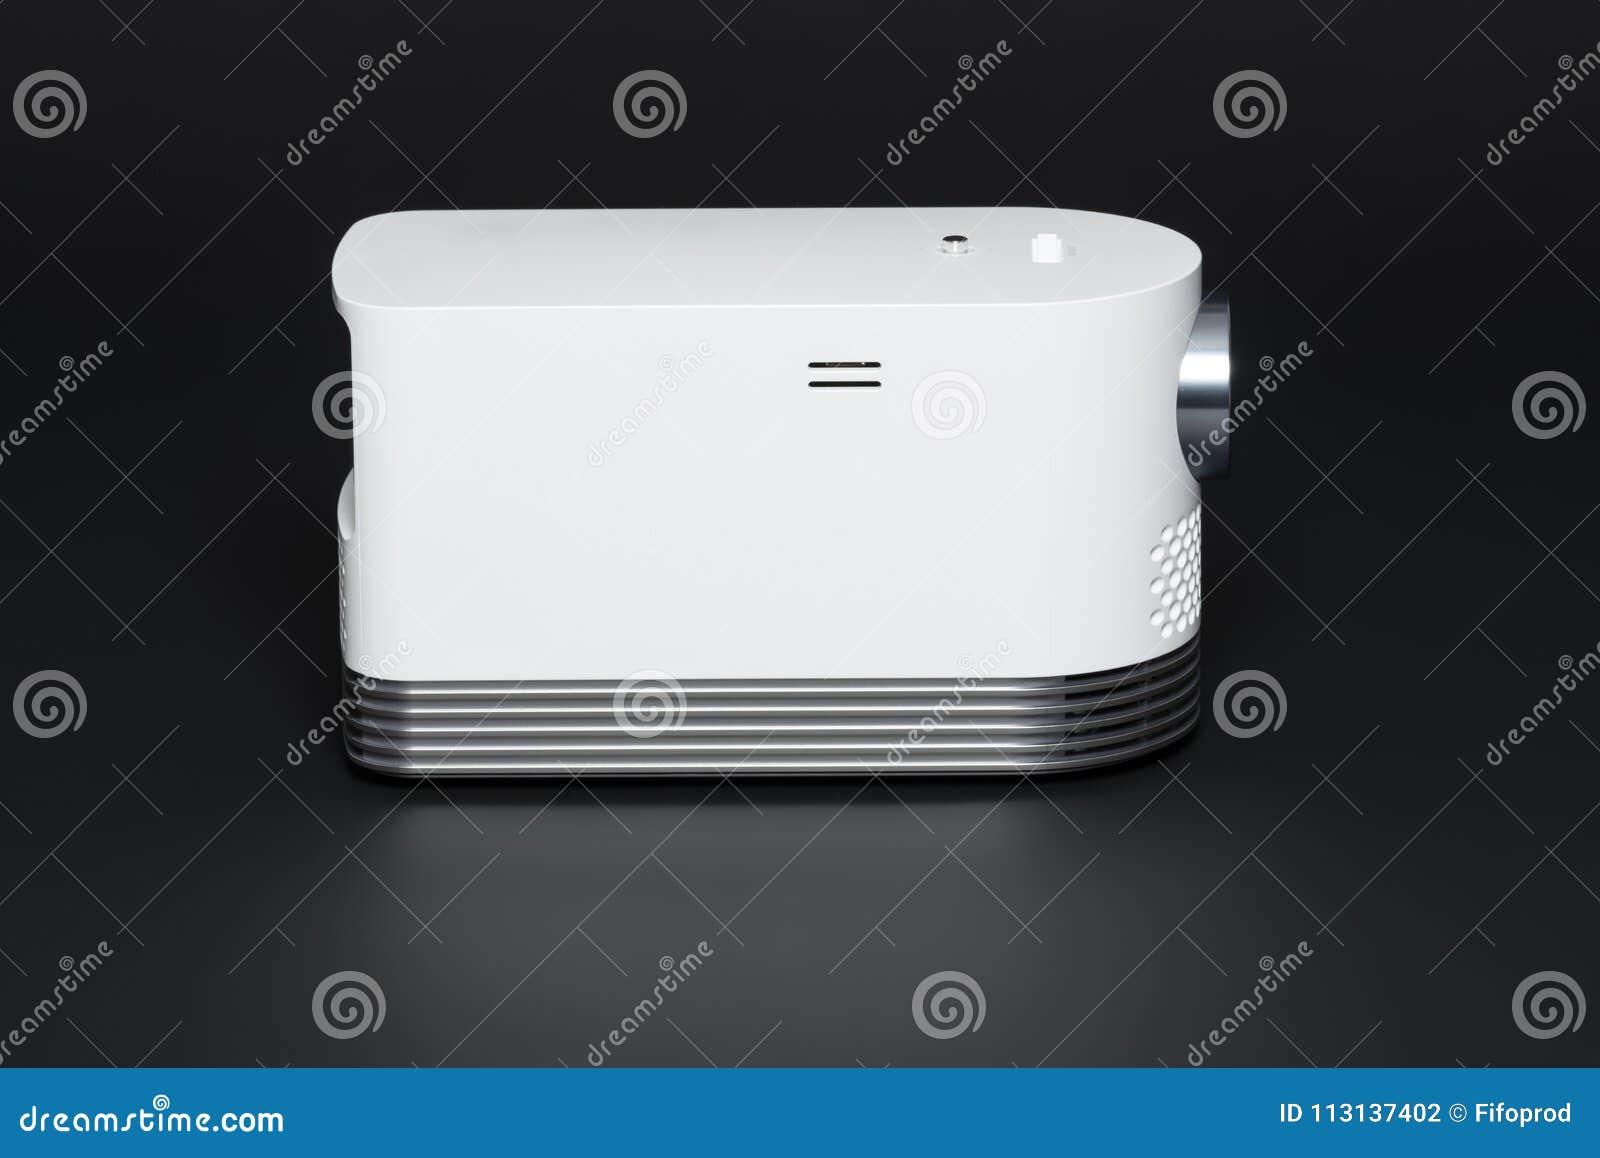 Stylish mini home cinema LED projector, lightweight tech gadget